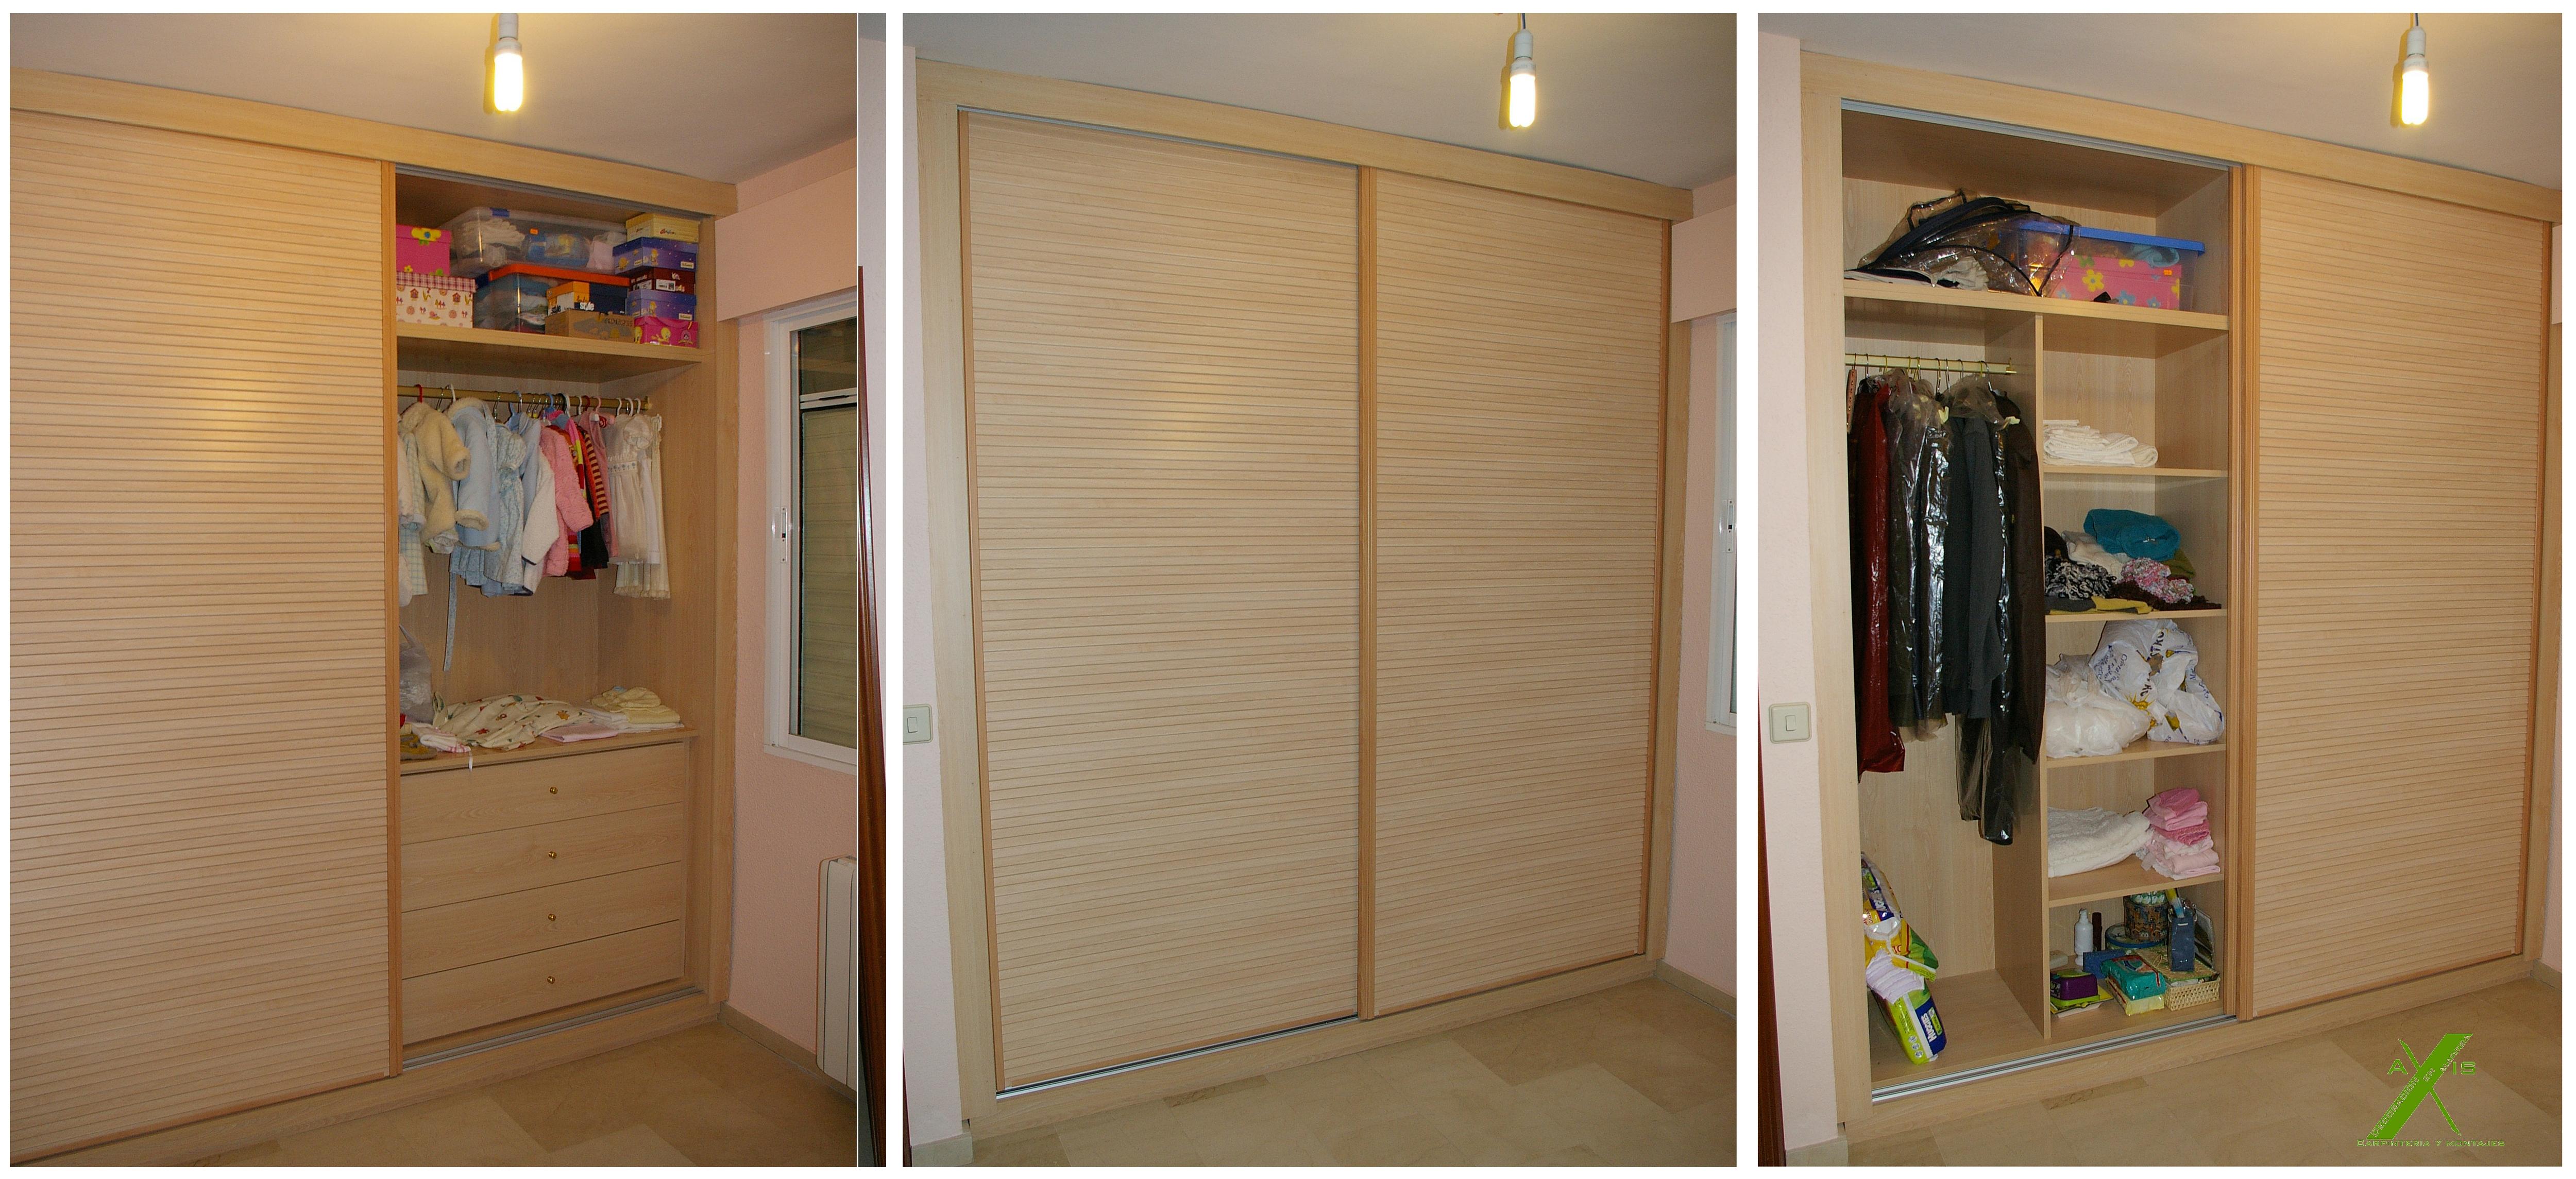 Armarios roperos y empotrados axis carpinter a y dise o for Disenos de roperos para dormitorios pequenos